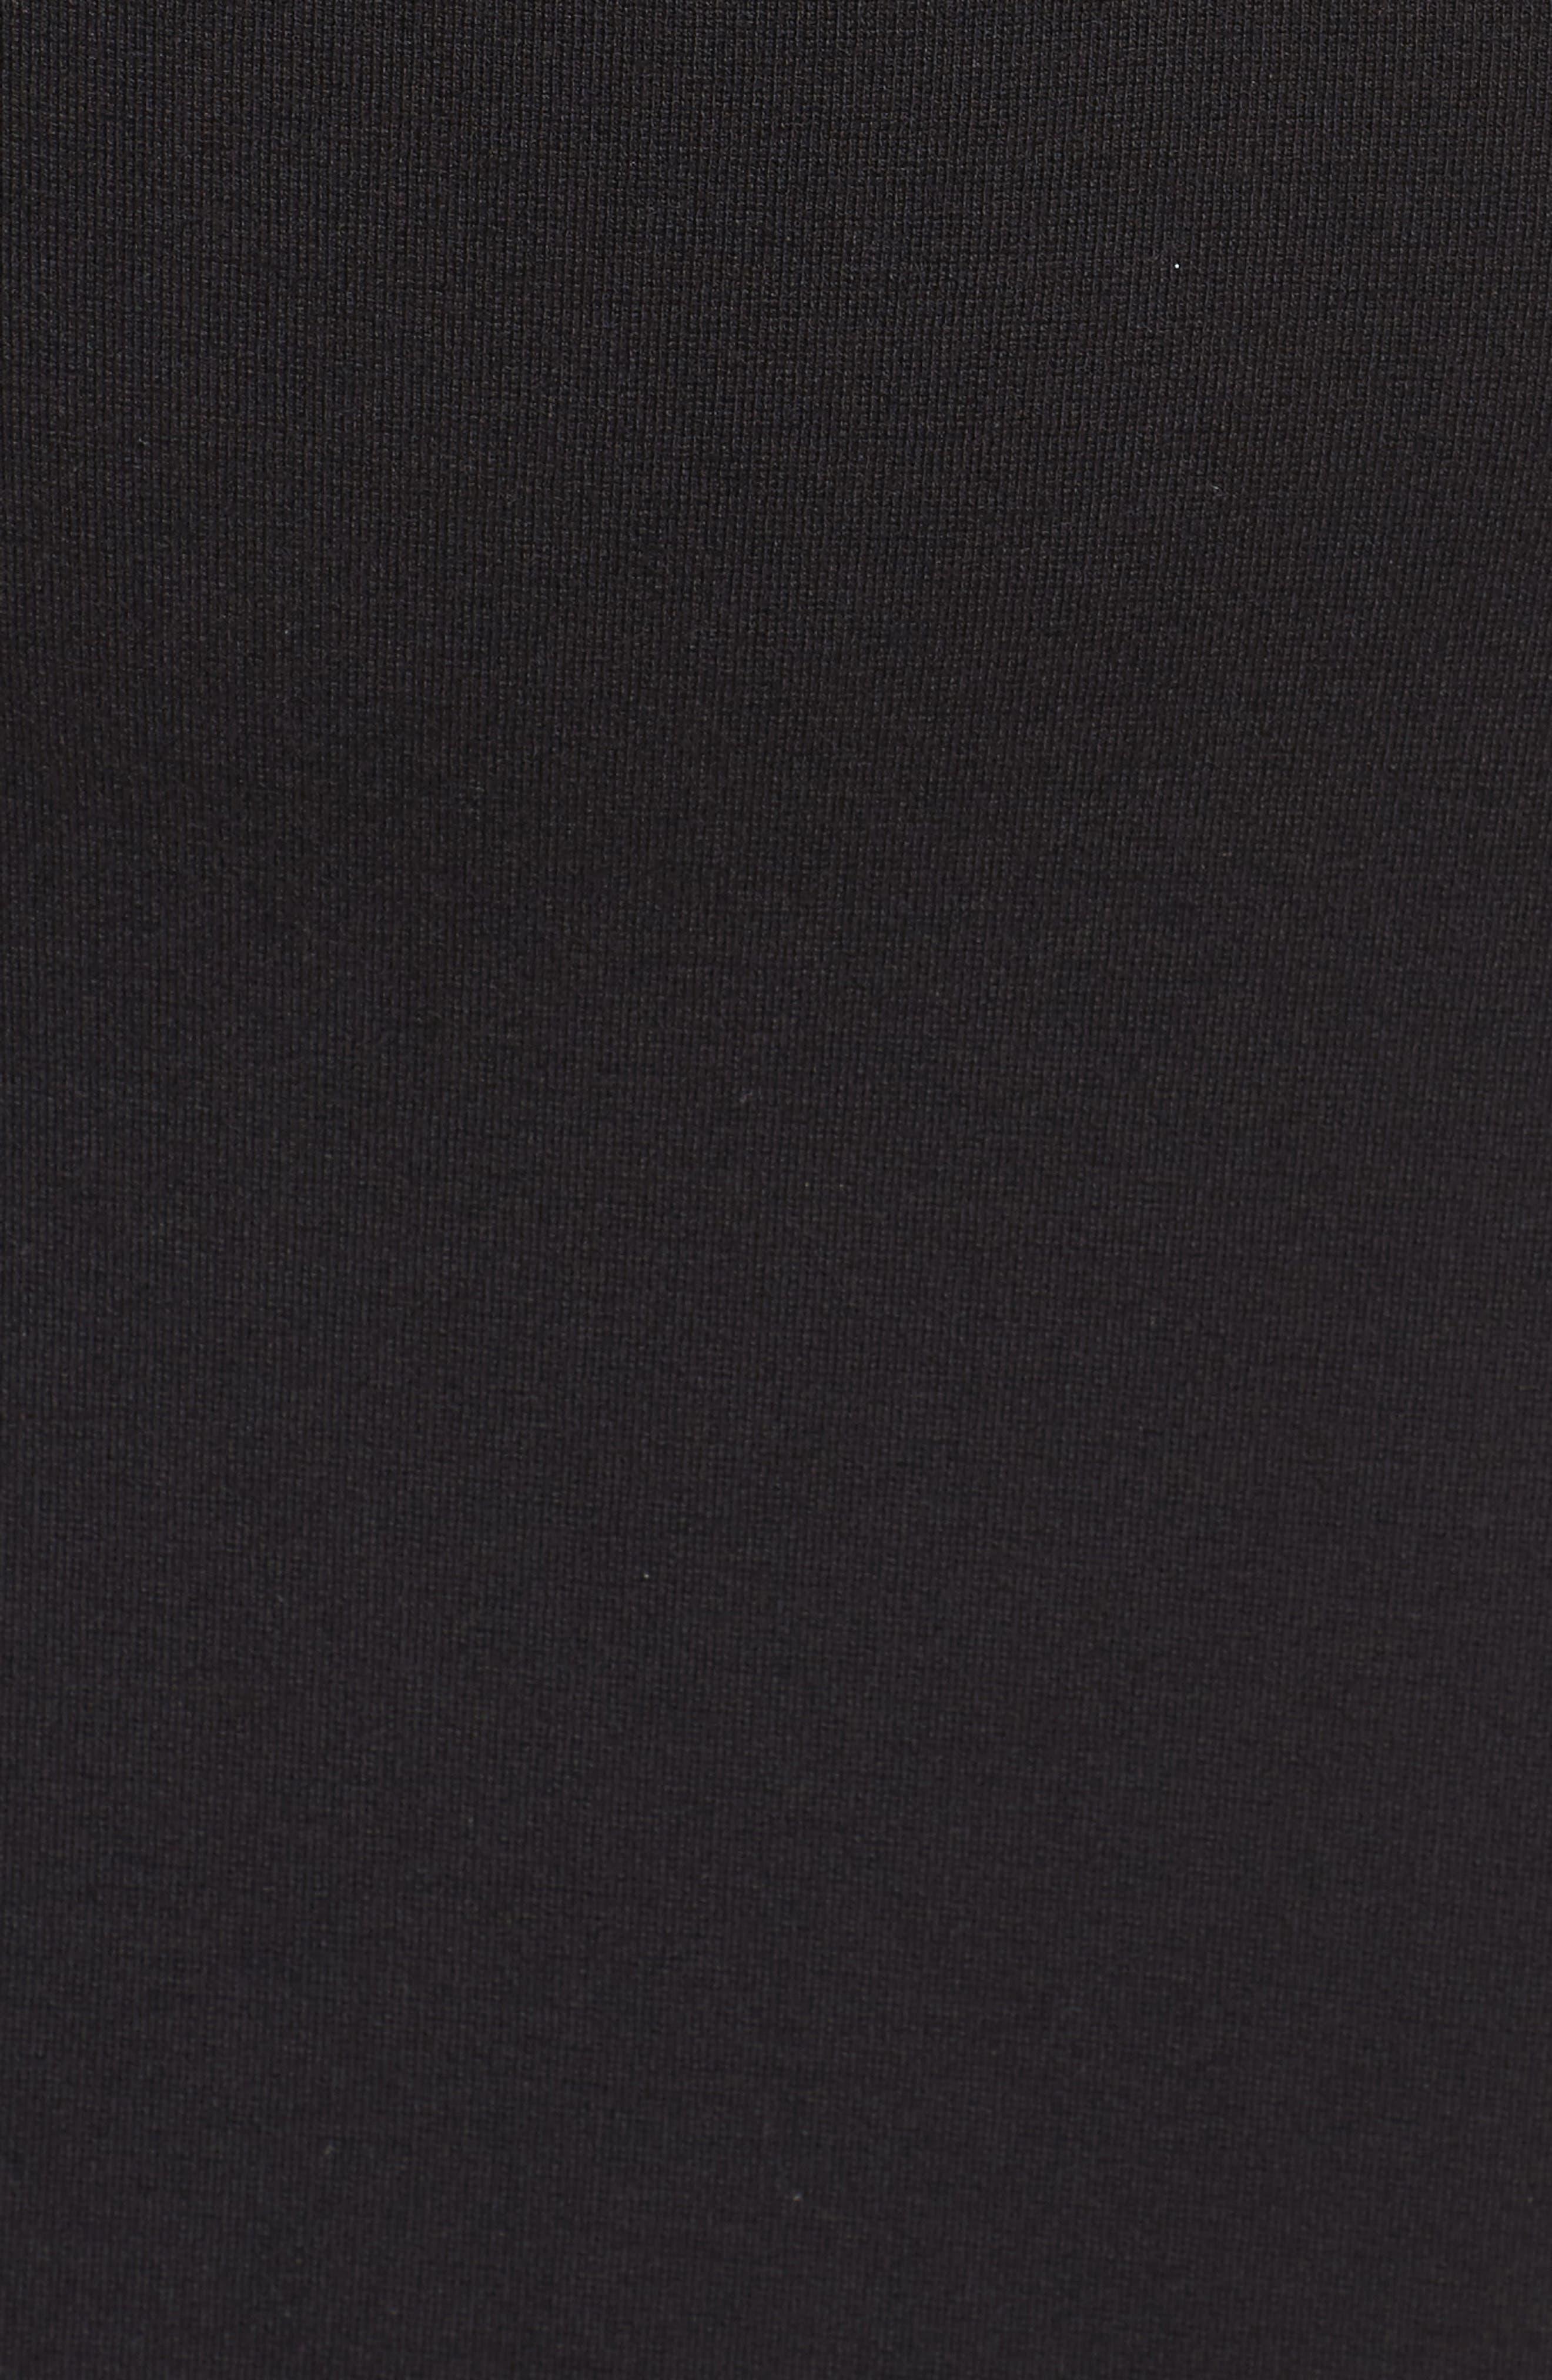 Viven Dress,                             Alternate thumbnail 5, color,                             001